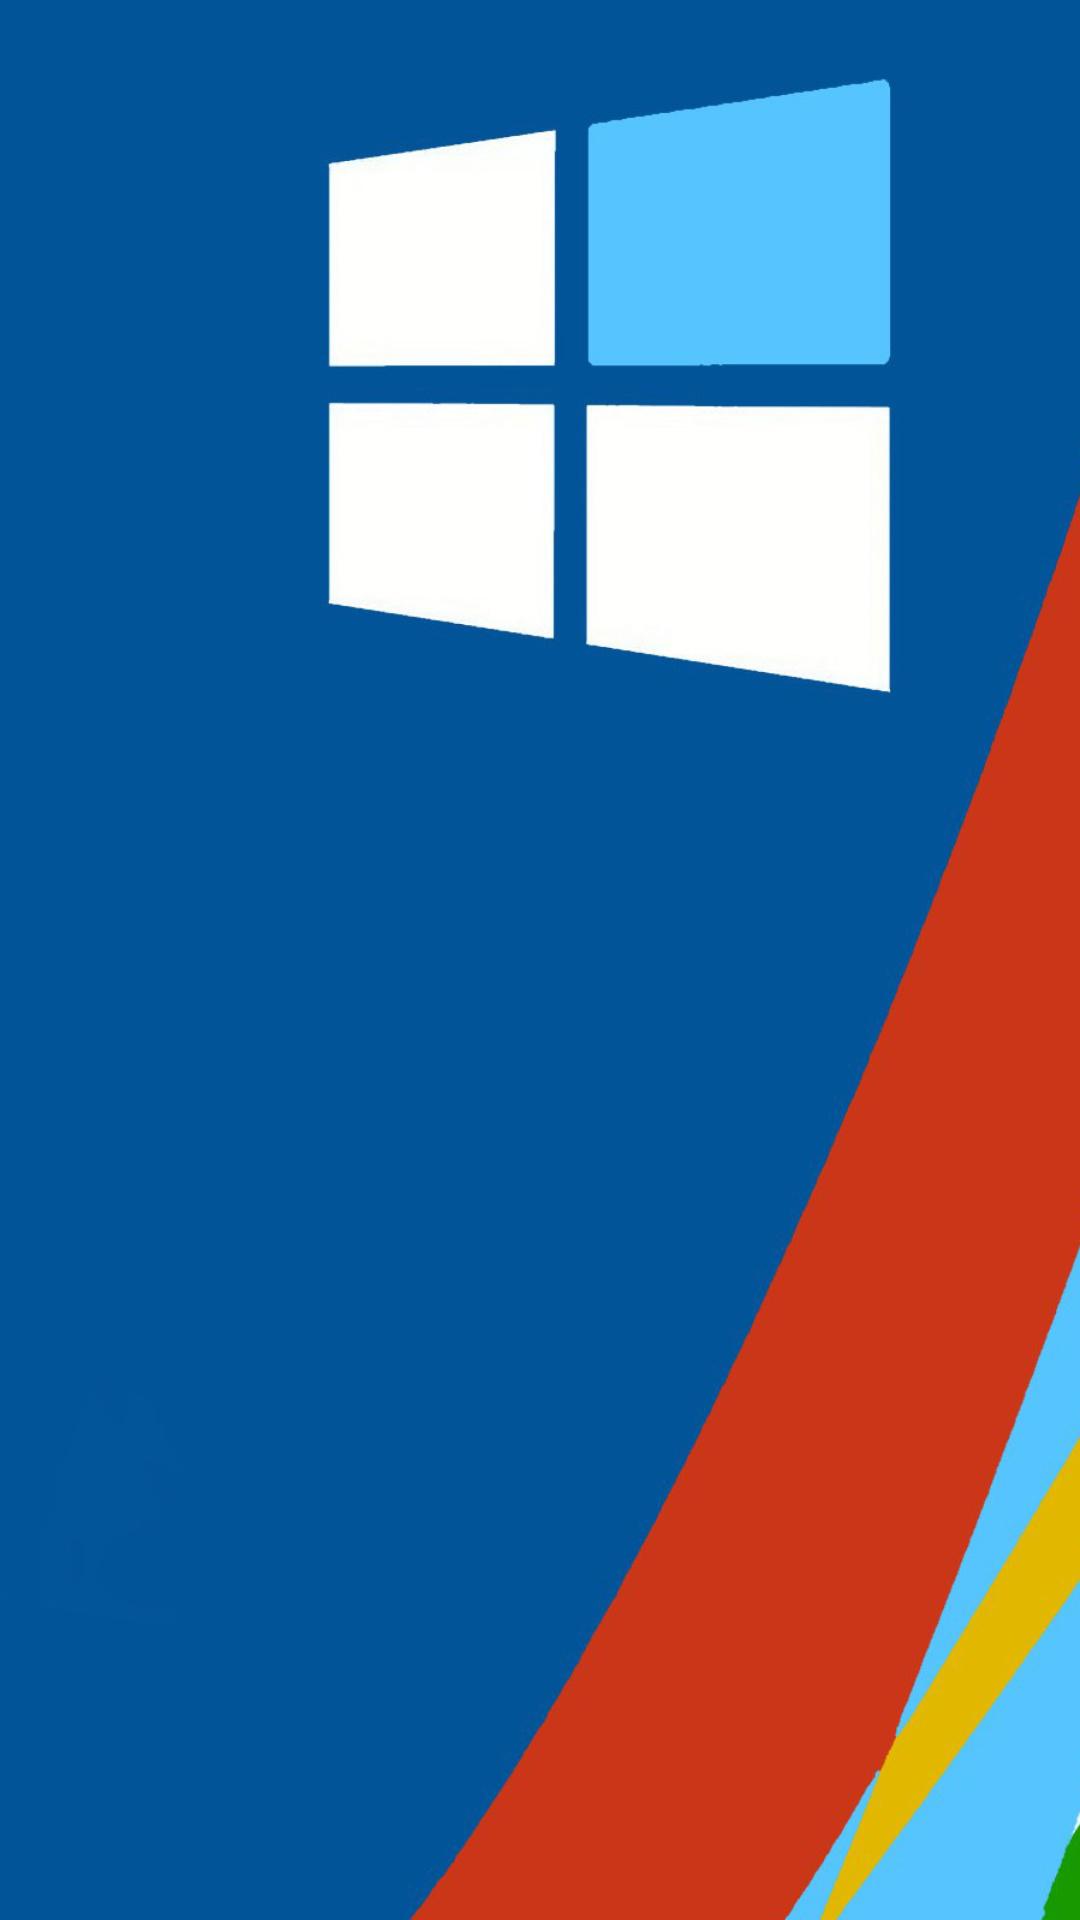 Windows 10 Hd Personalization Wallpaper For 1080x1920